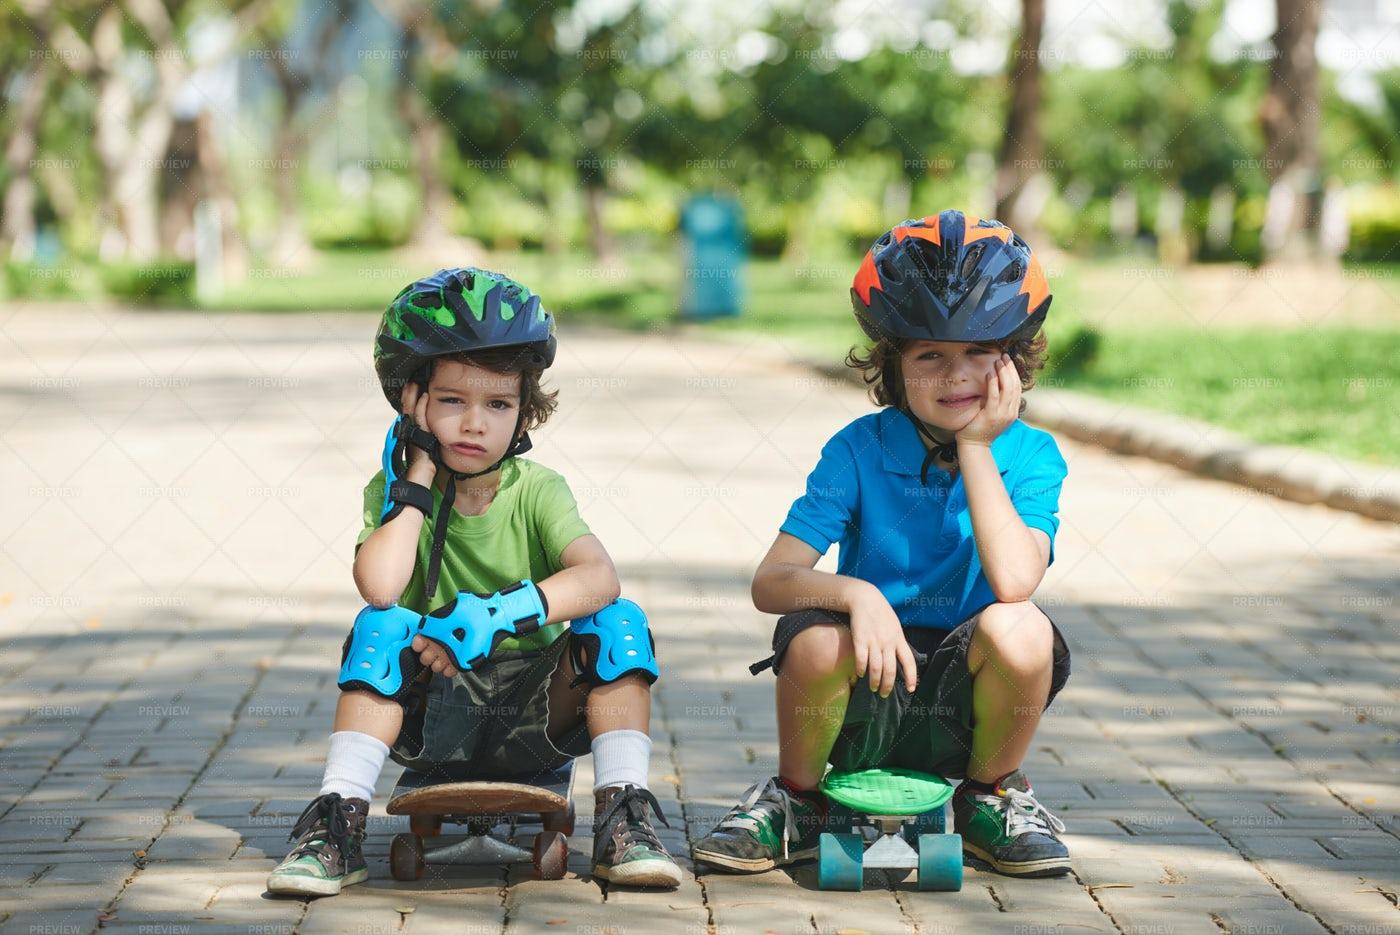 Two Little Skateboarders In Summer...: Stock Photos